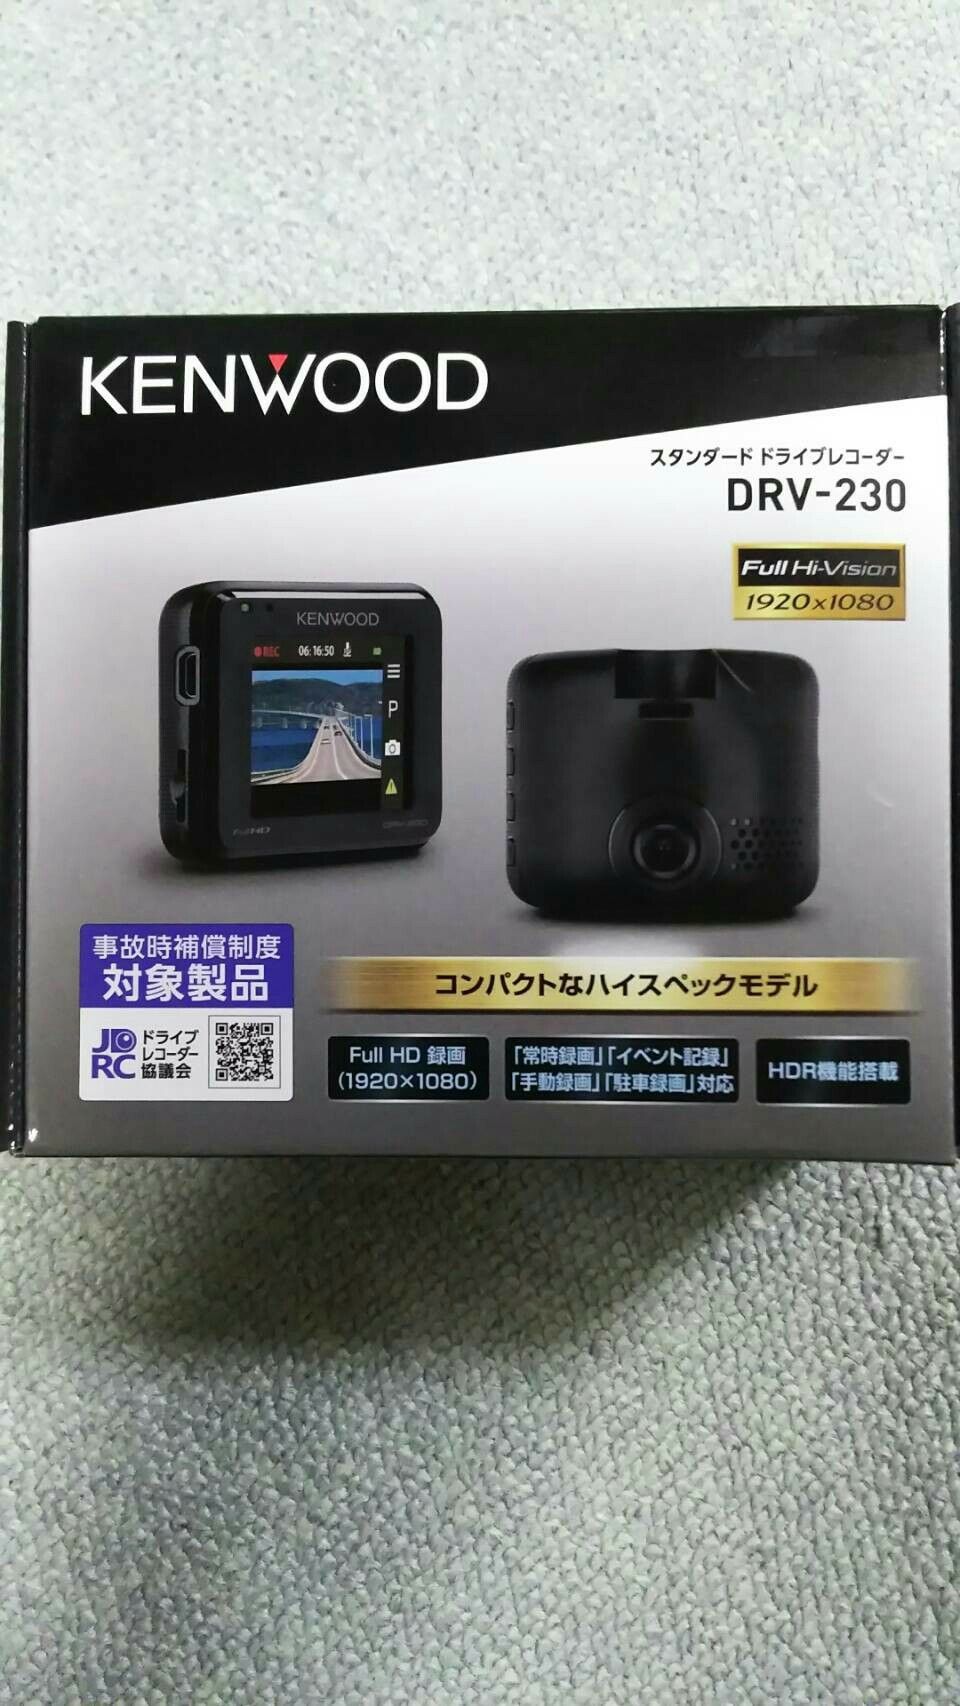 KENWOOD DRV-230